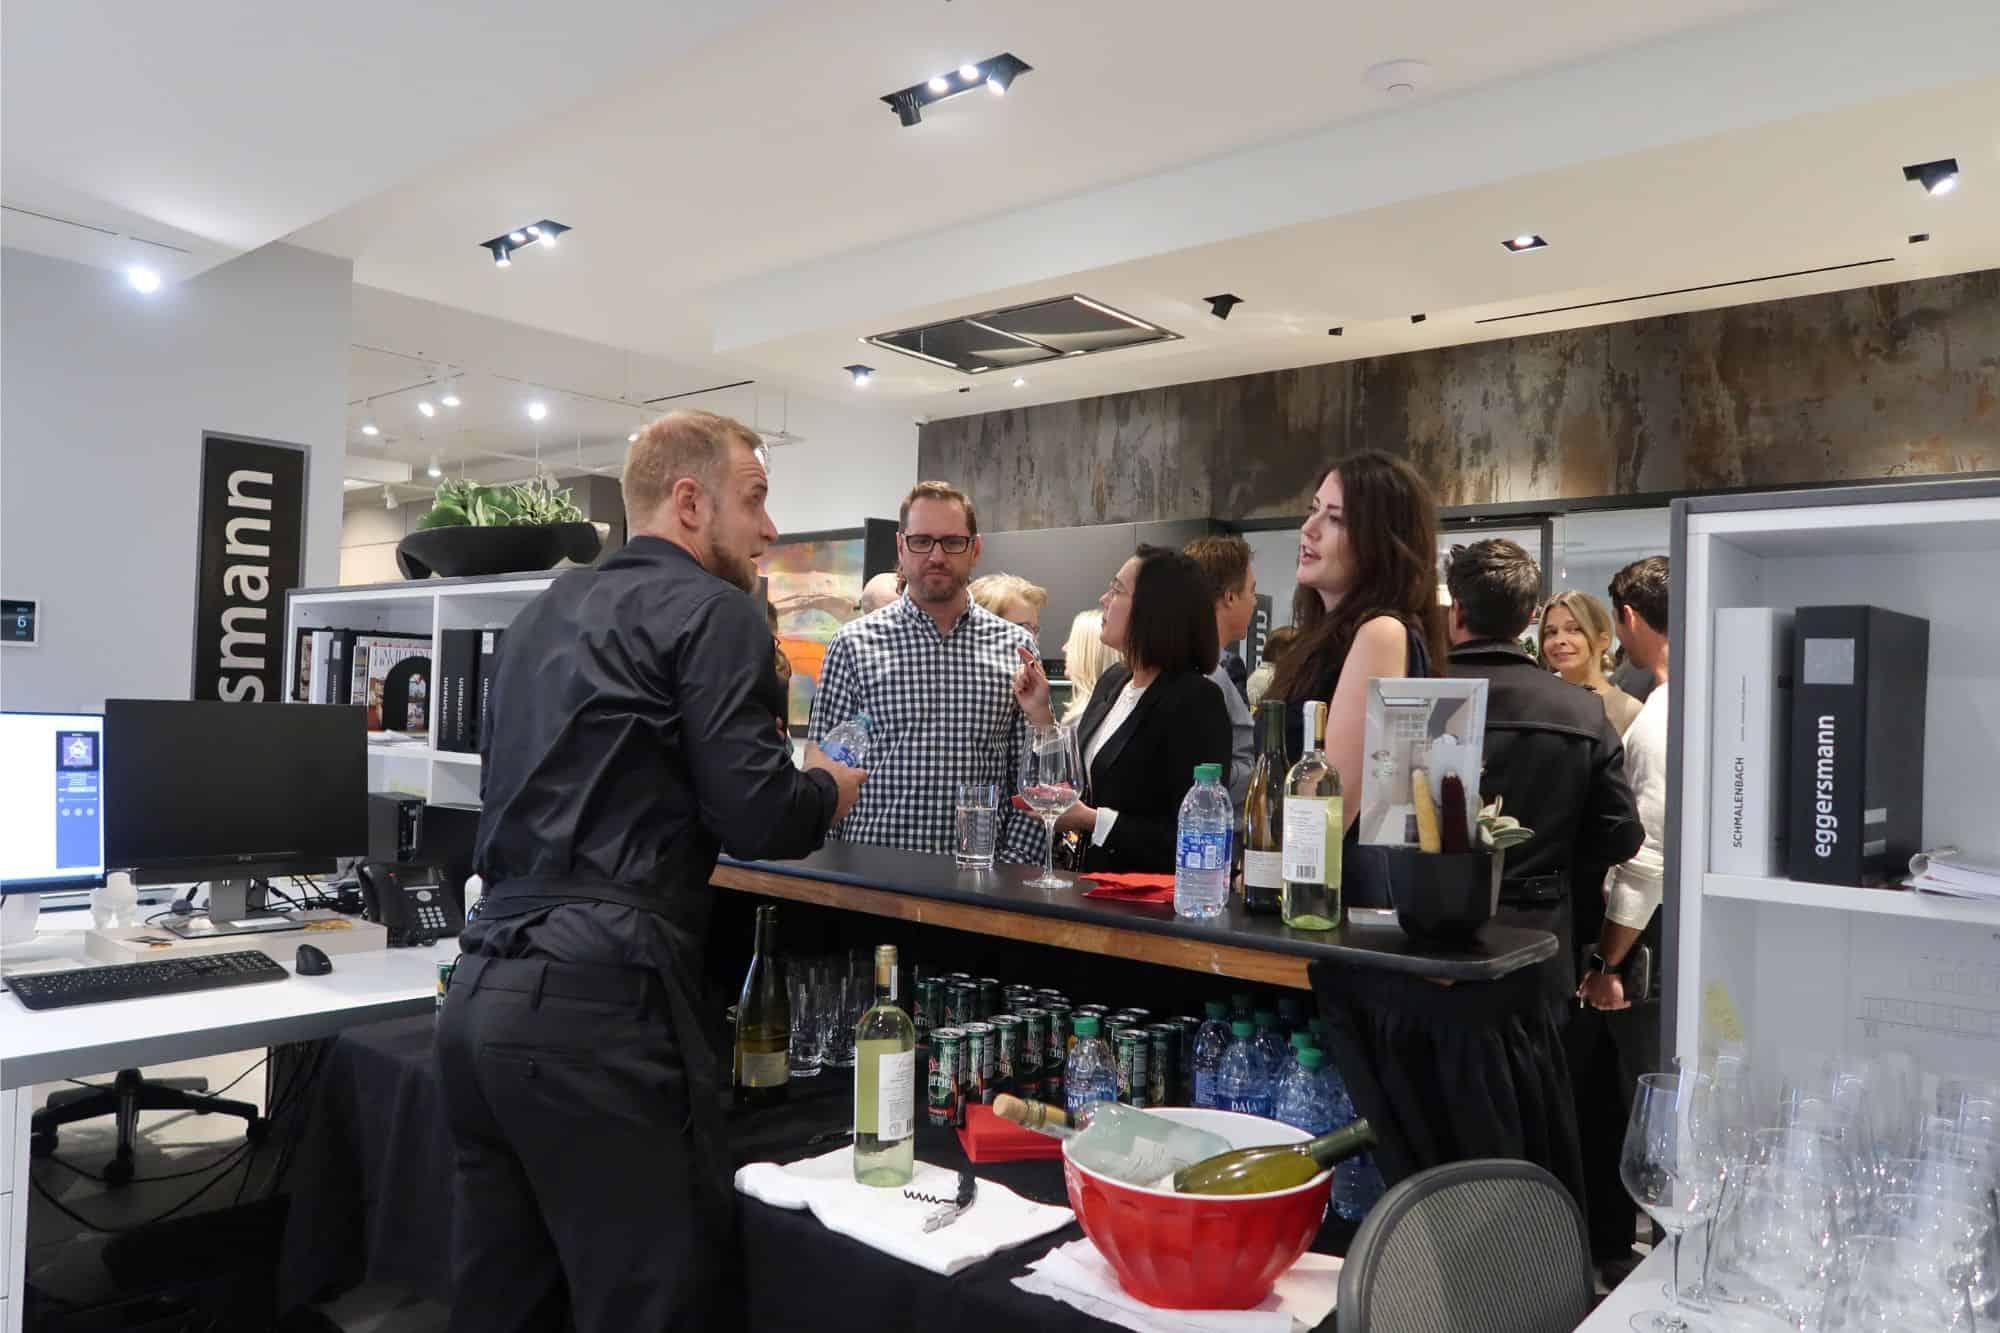 designers enjoying a visit before the making function fabulous event at eggersmann la